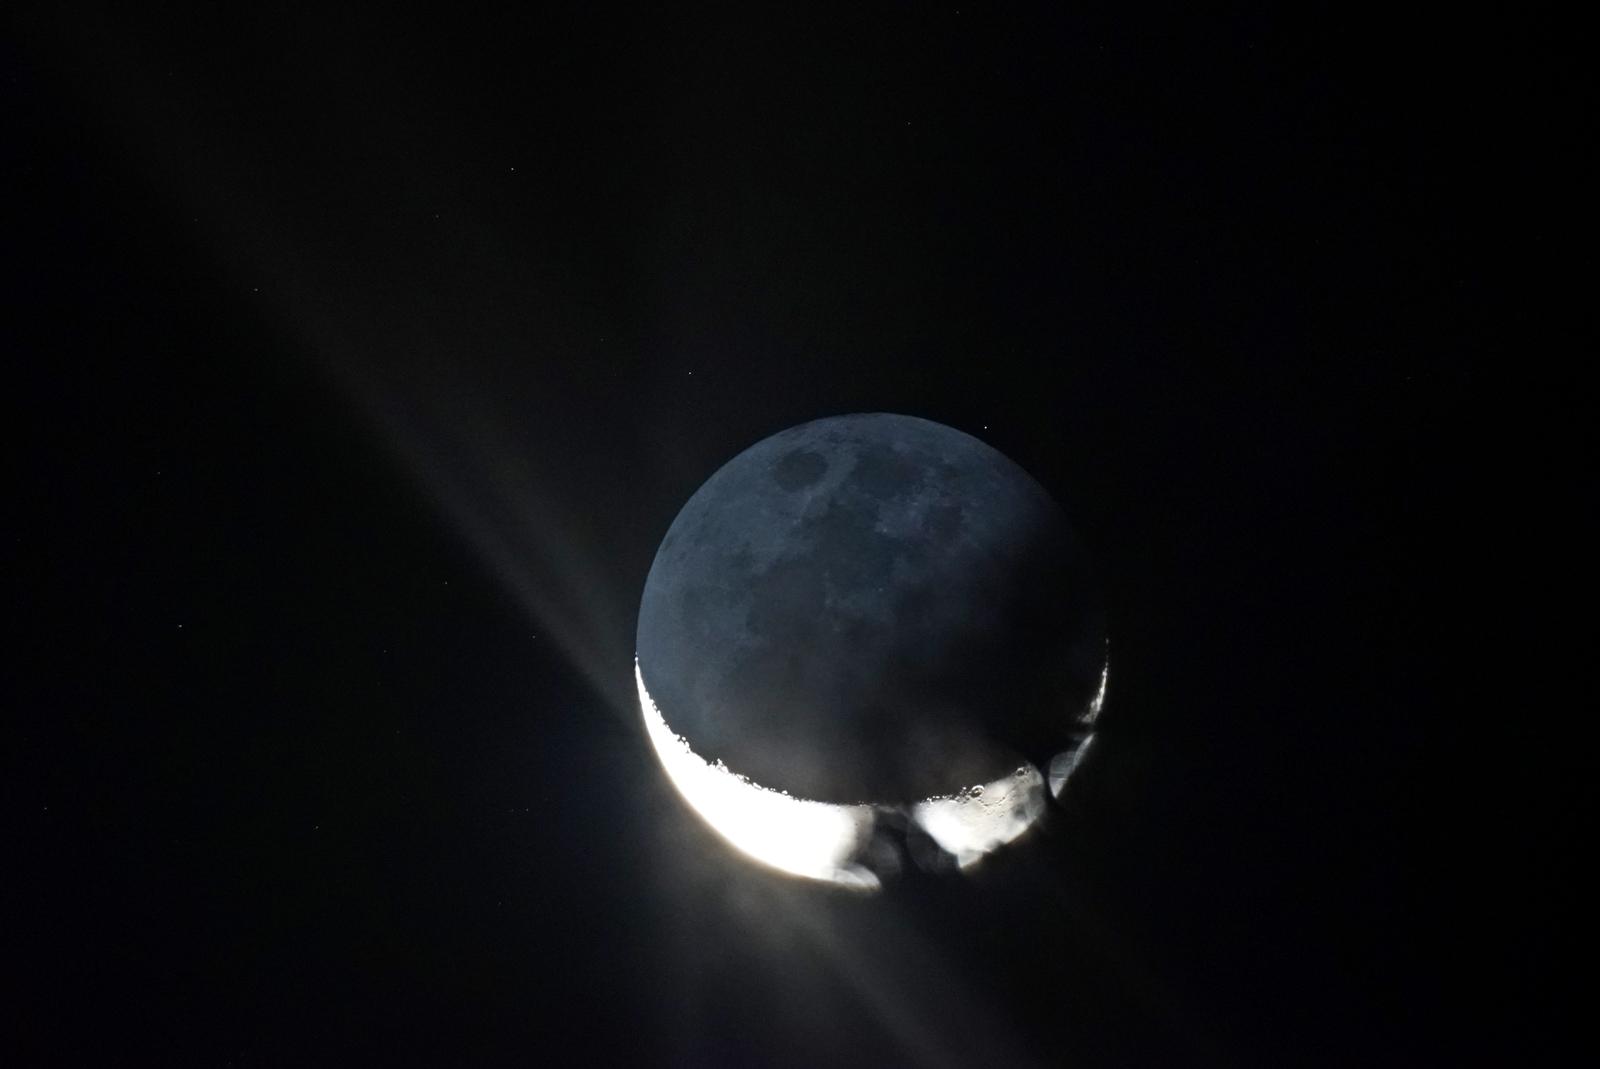 moon_up2.JPG